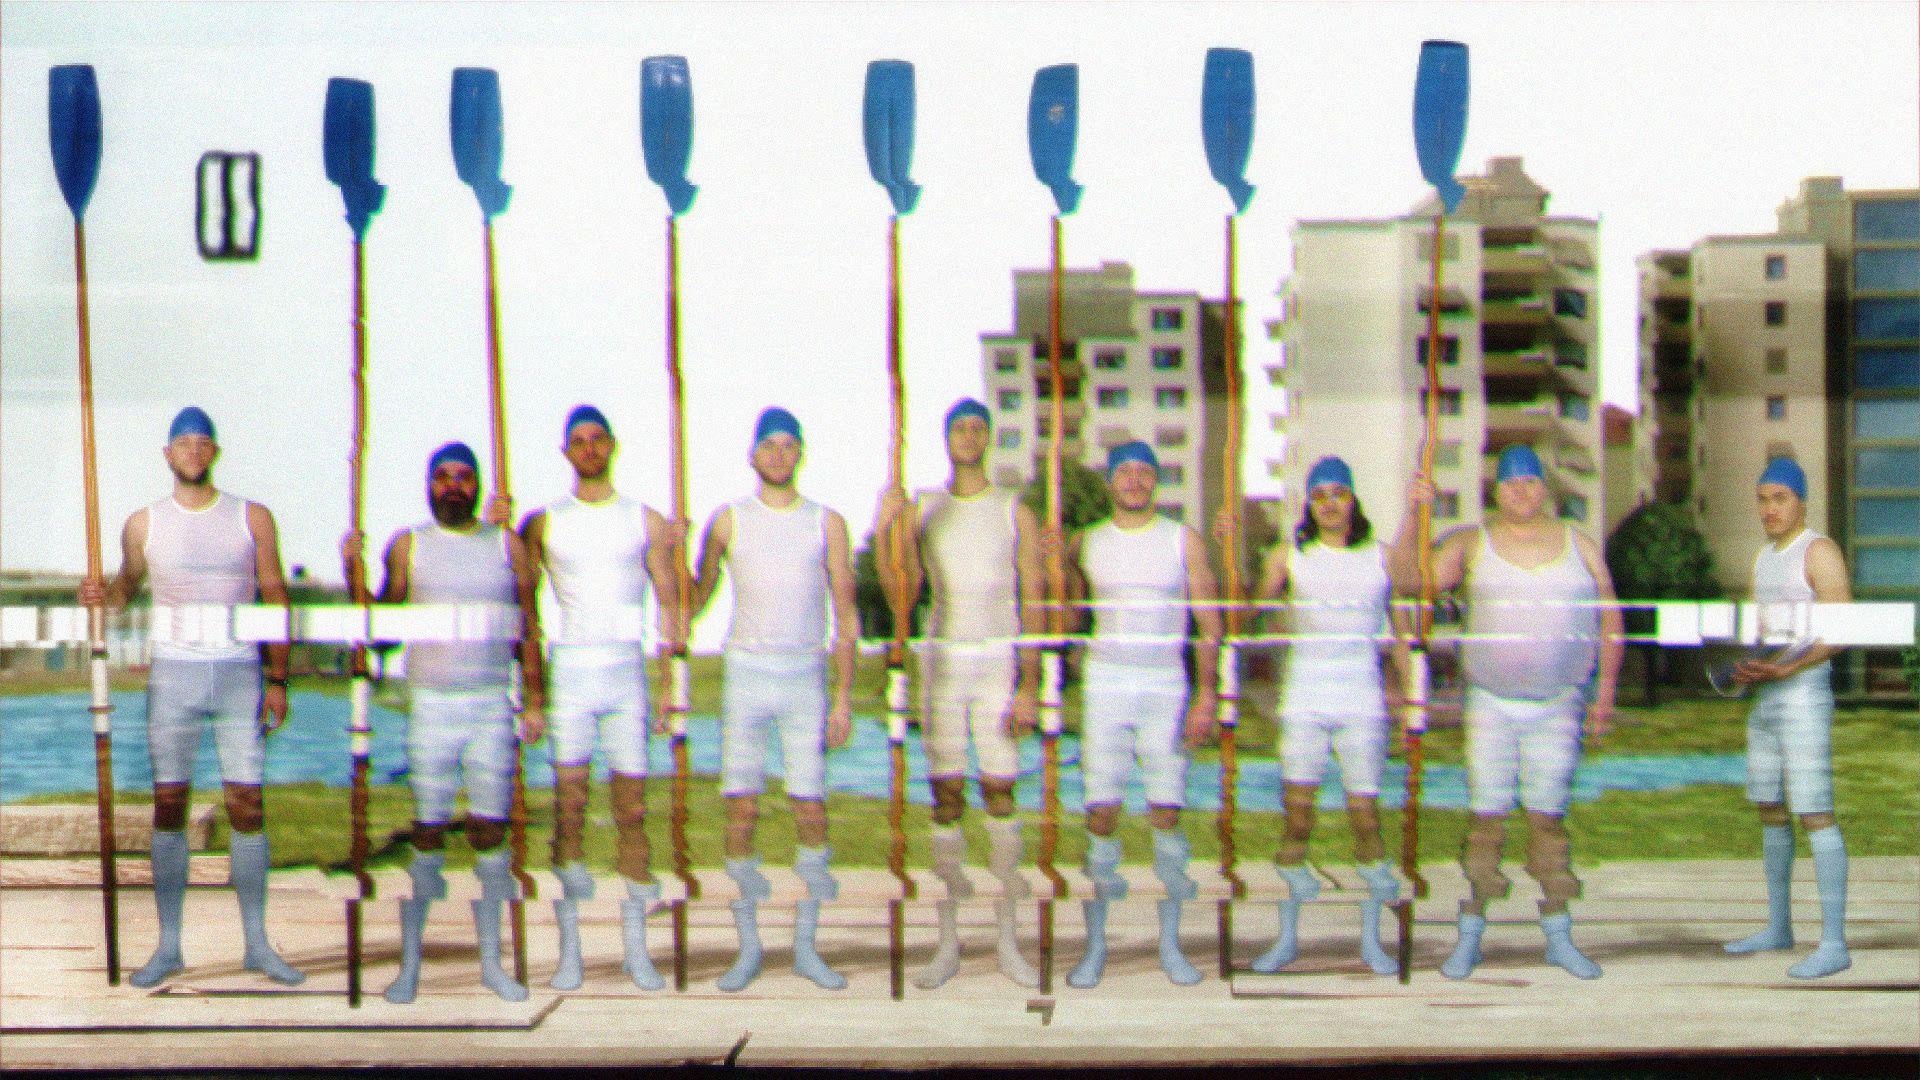 7162fd14ee0b24d1774a1c4a28c91ce3 Unique De Promo Parasol Schème